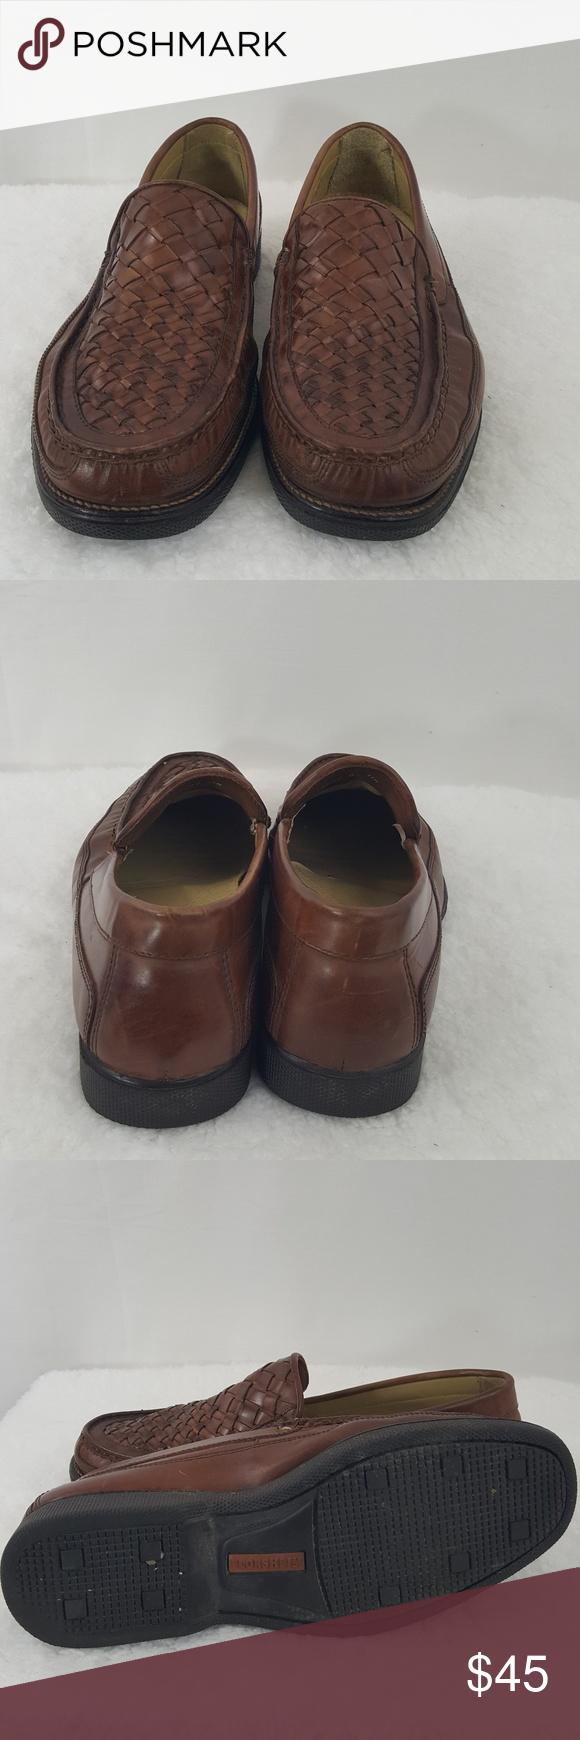 a6229868d97 Florsheim Mens Loafer Size 11 D Brown Woven Top •Great Condition Shoes Size  11 D